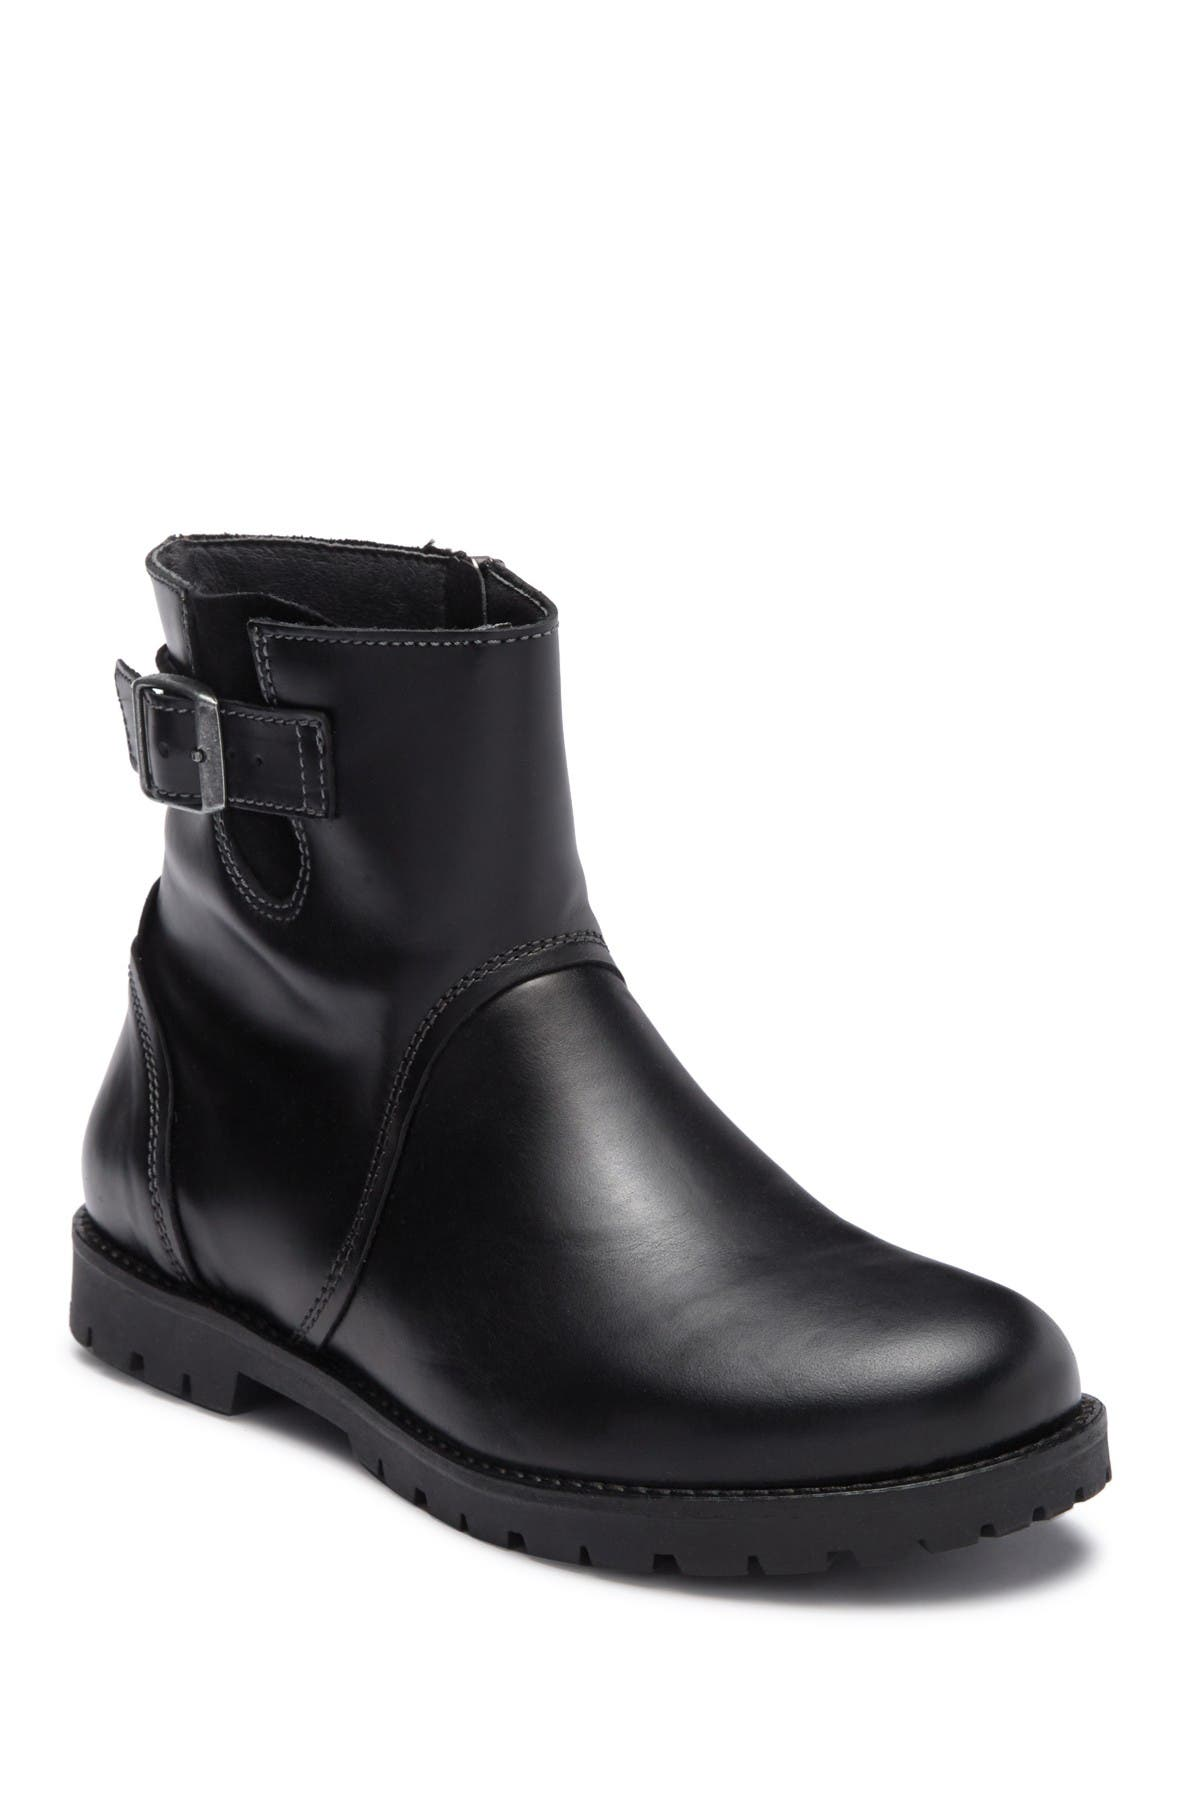 Birkenstock   Stowe Leather Moto Boot